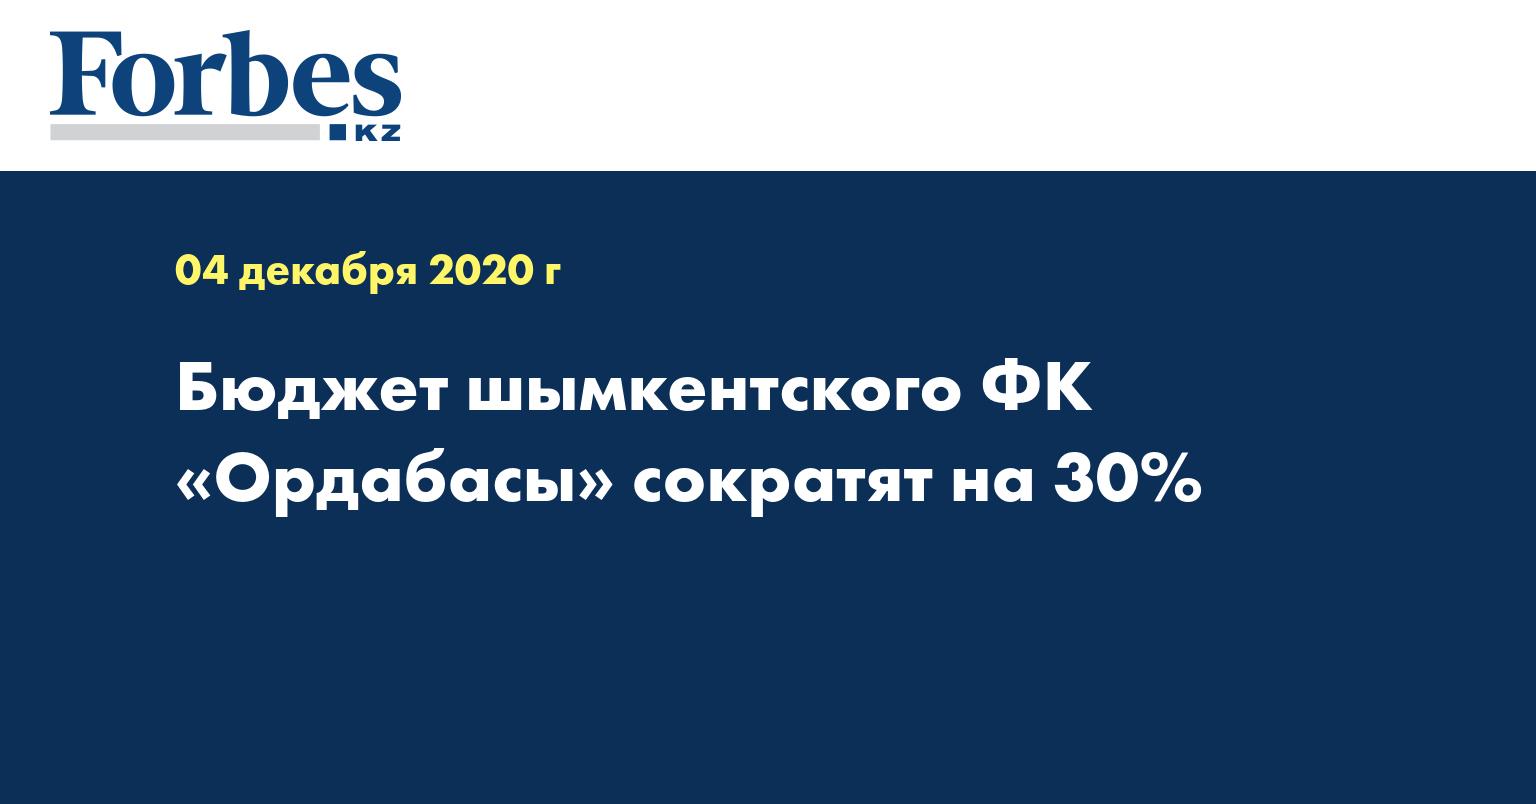 Бюджет шымкентского ФК «Ордабасы» сократят на 30%